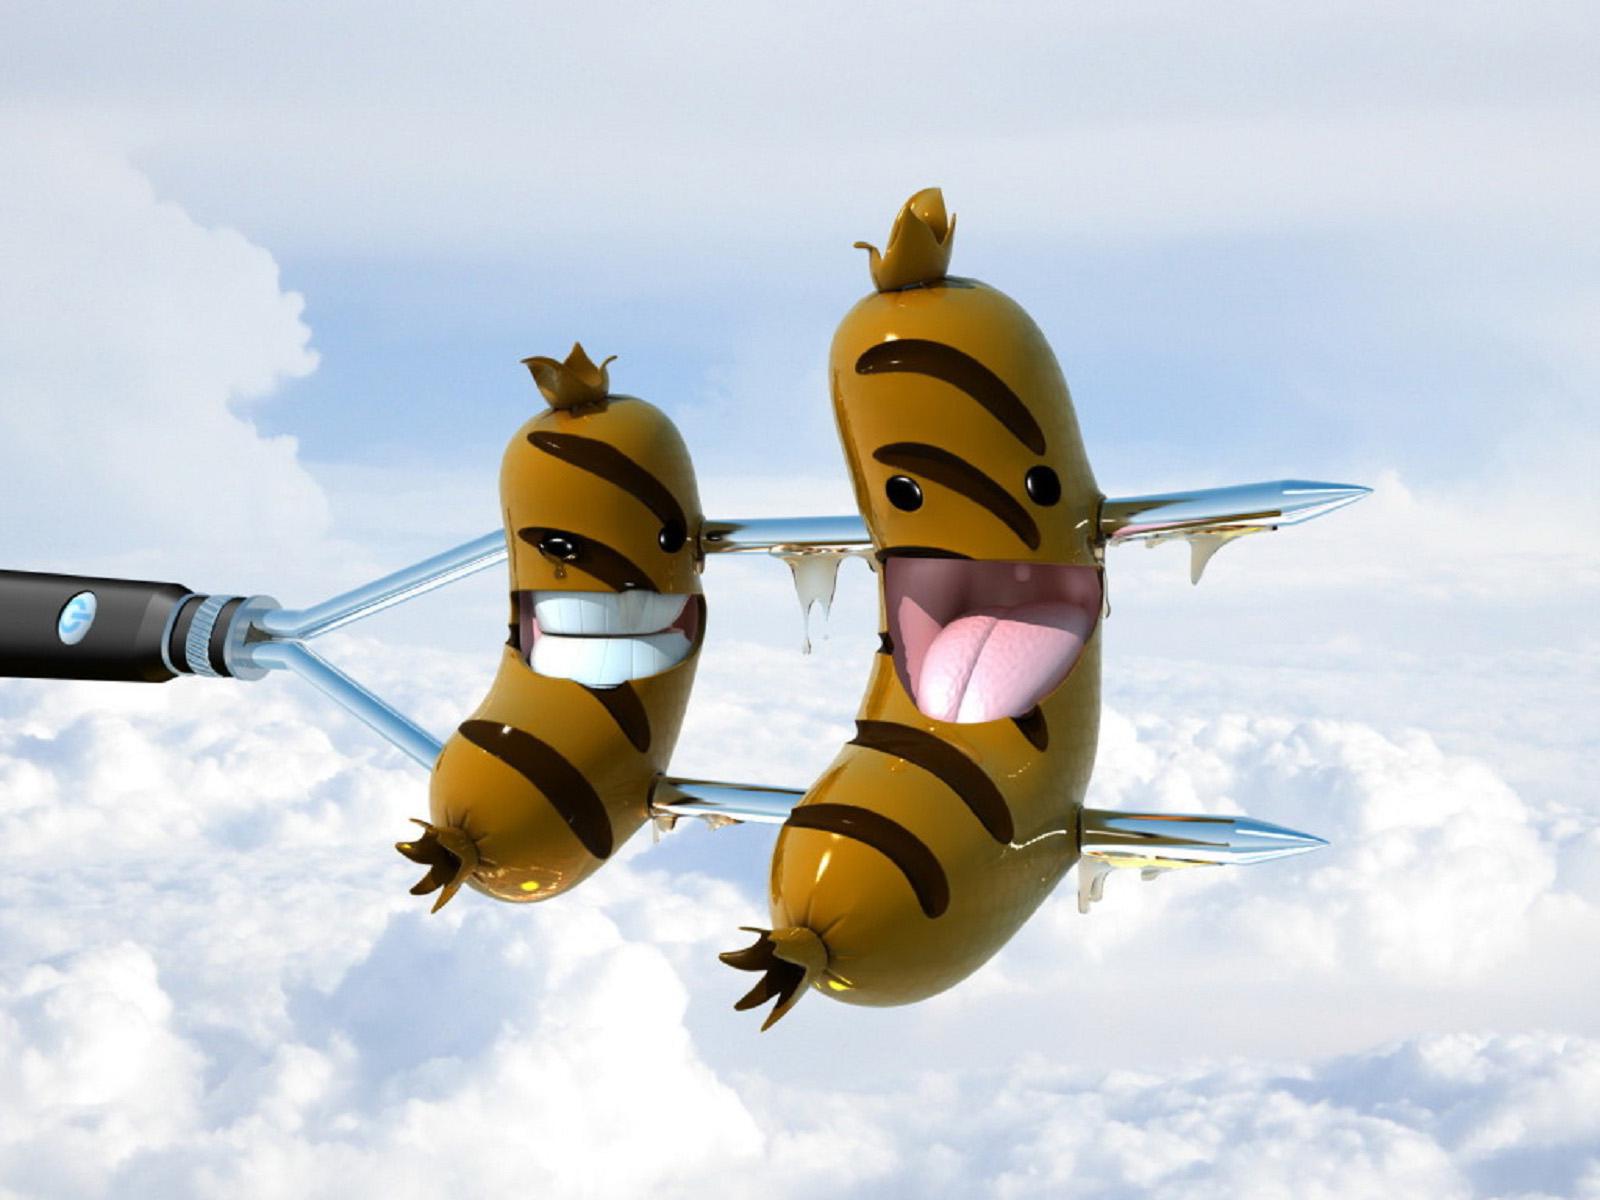 Best top desktop funny wallpapers hd funny wallpaper picture image 2 1600x1200